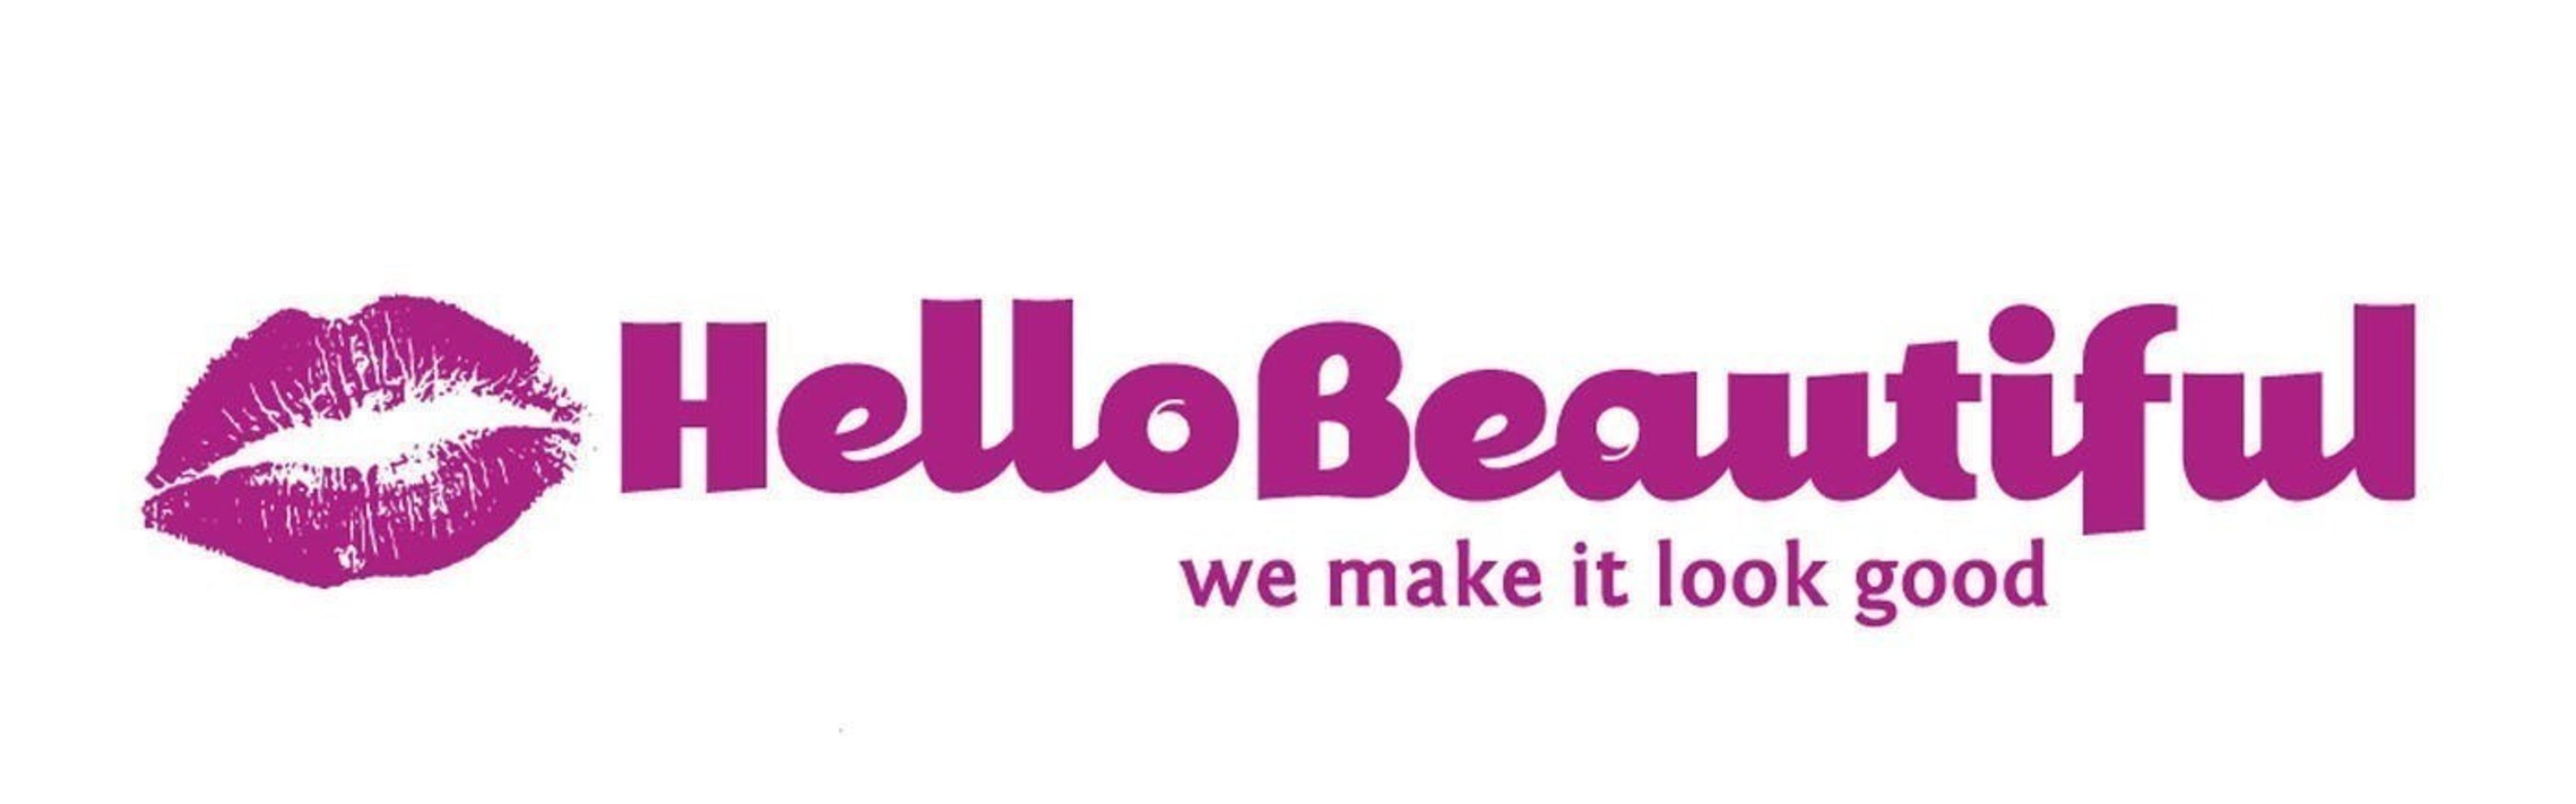 HelloBeautiful logo